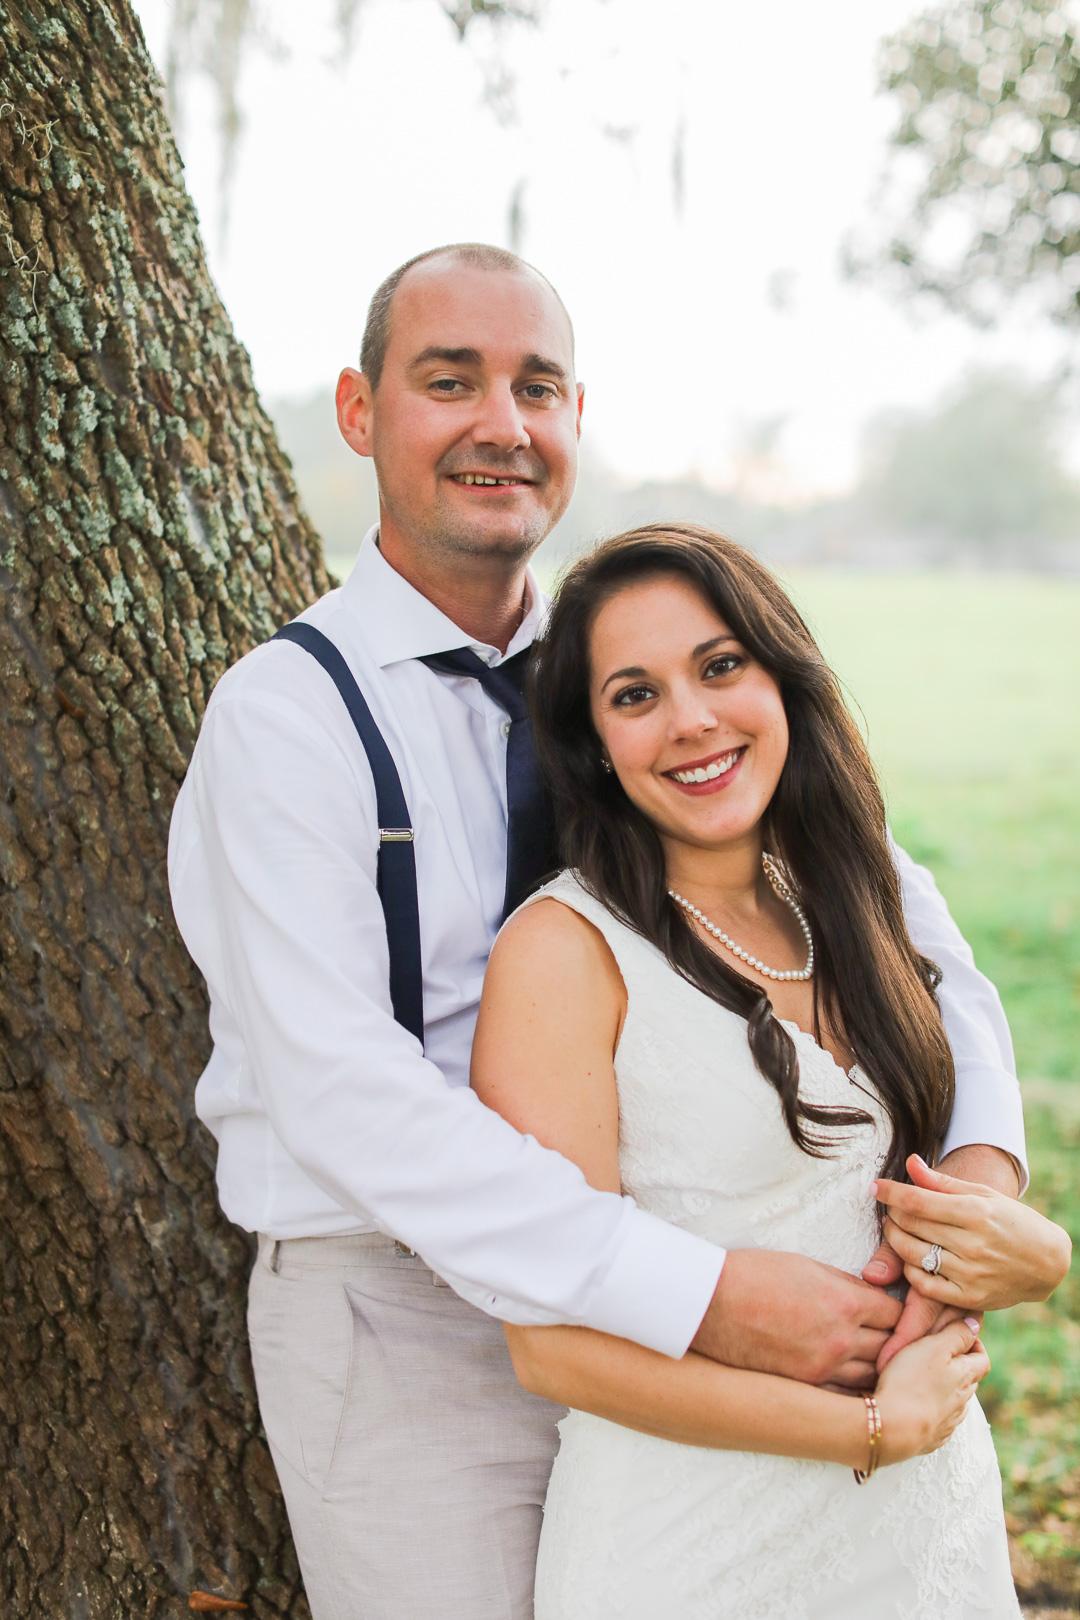 williams_family_newlywed-138.jpg